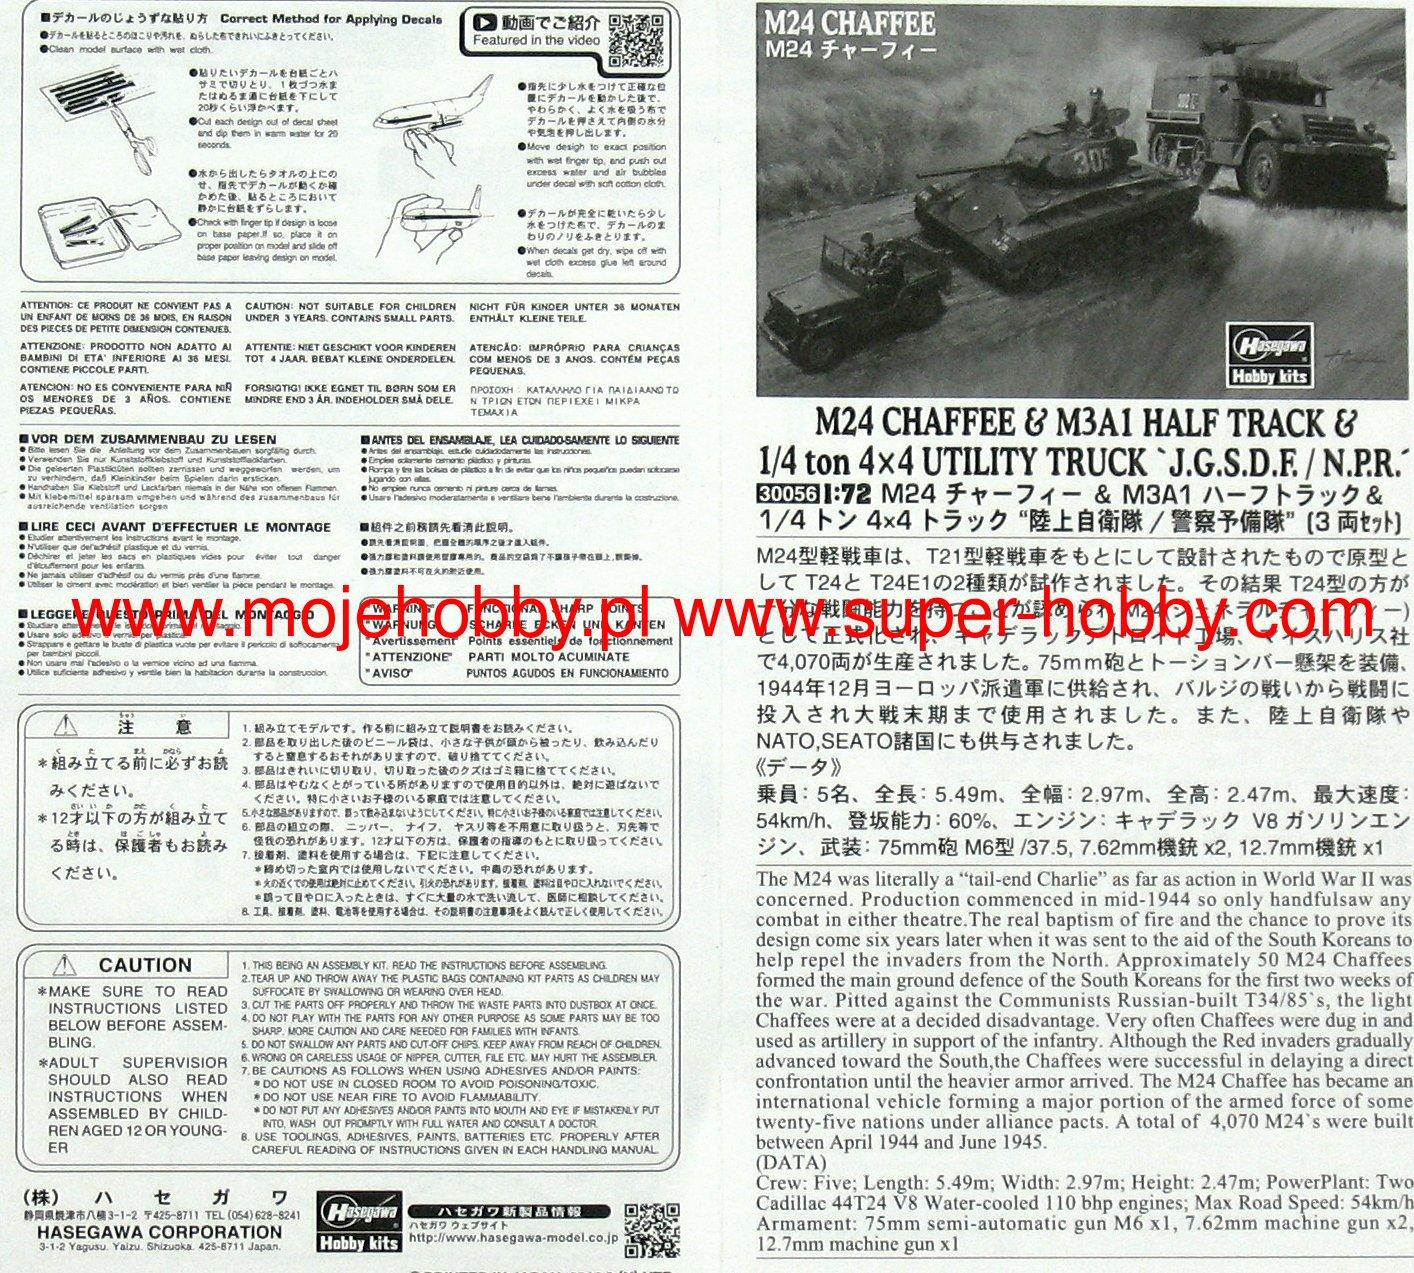 M24 Chaffee & M3A1 Half Track & 1/4-Ton 4x4 Truck `JGSDF/National Police  Reserve`